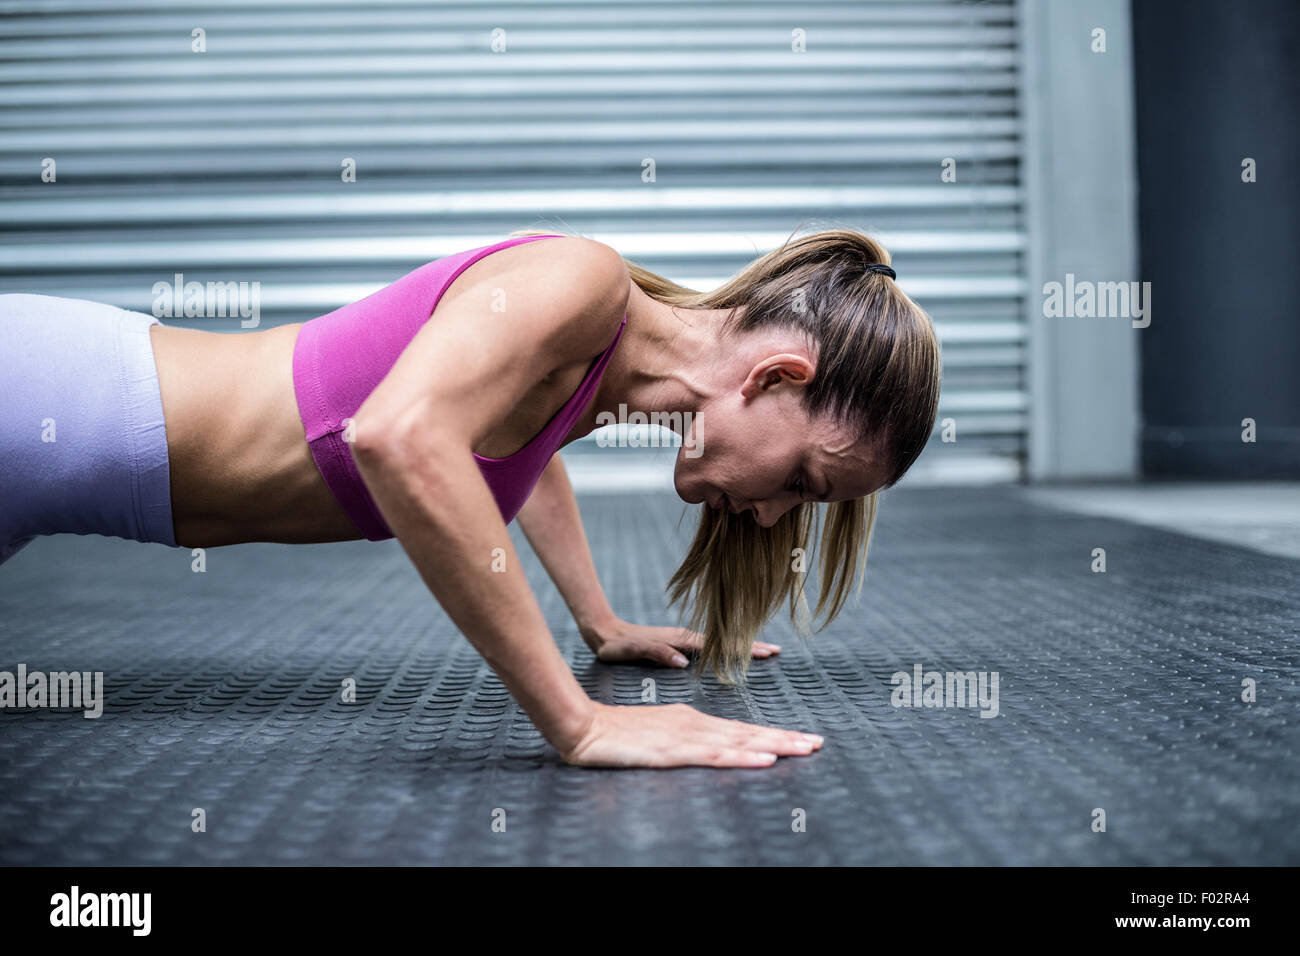 Donna muscolare facendo ups push Immagini Stock